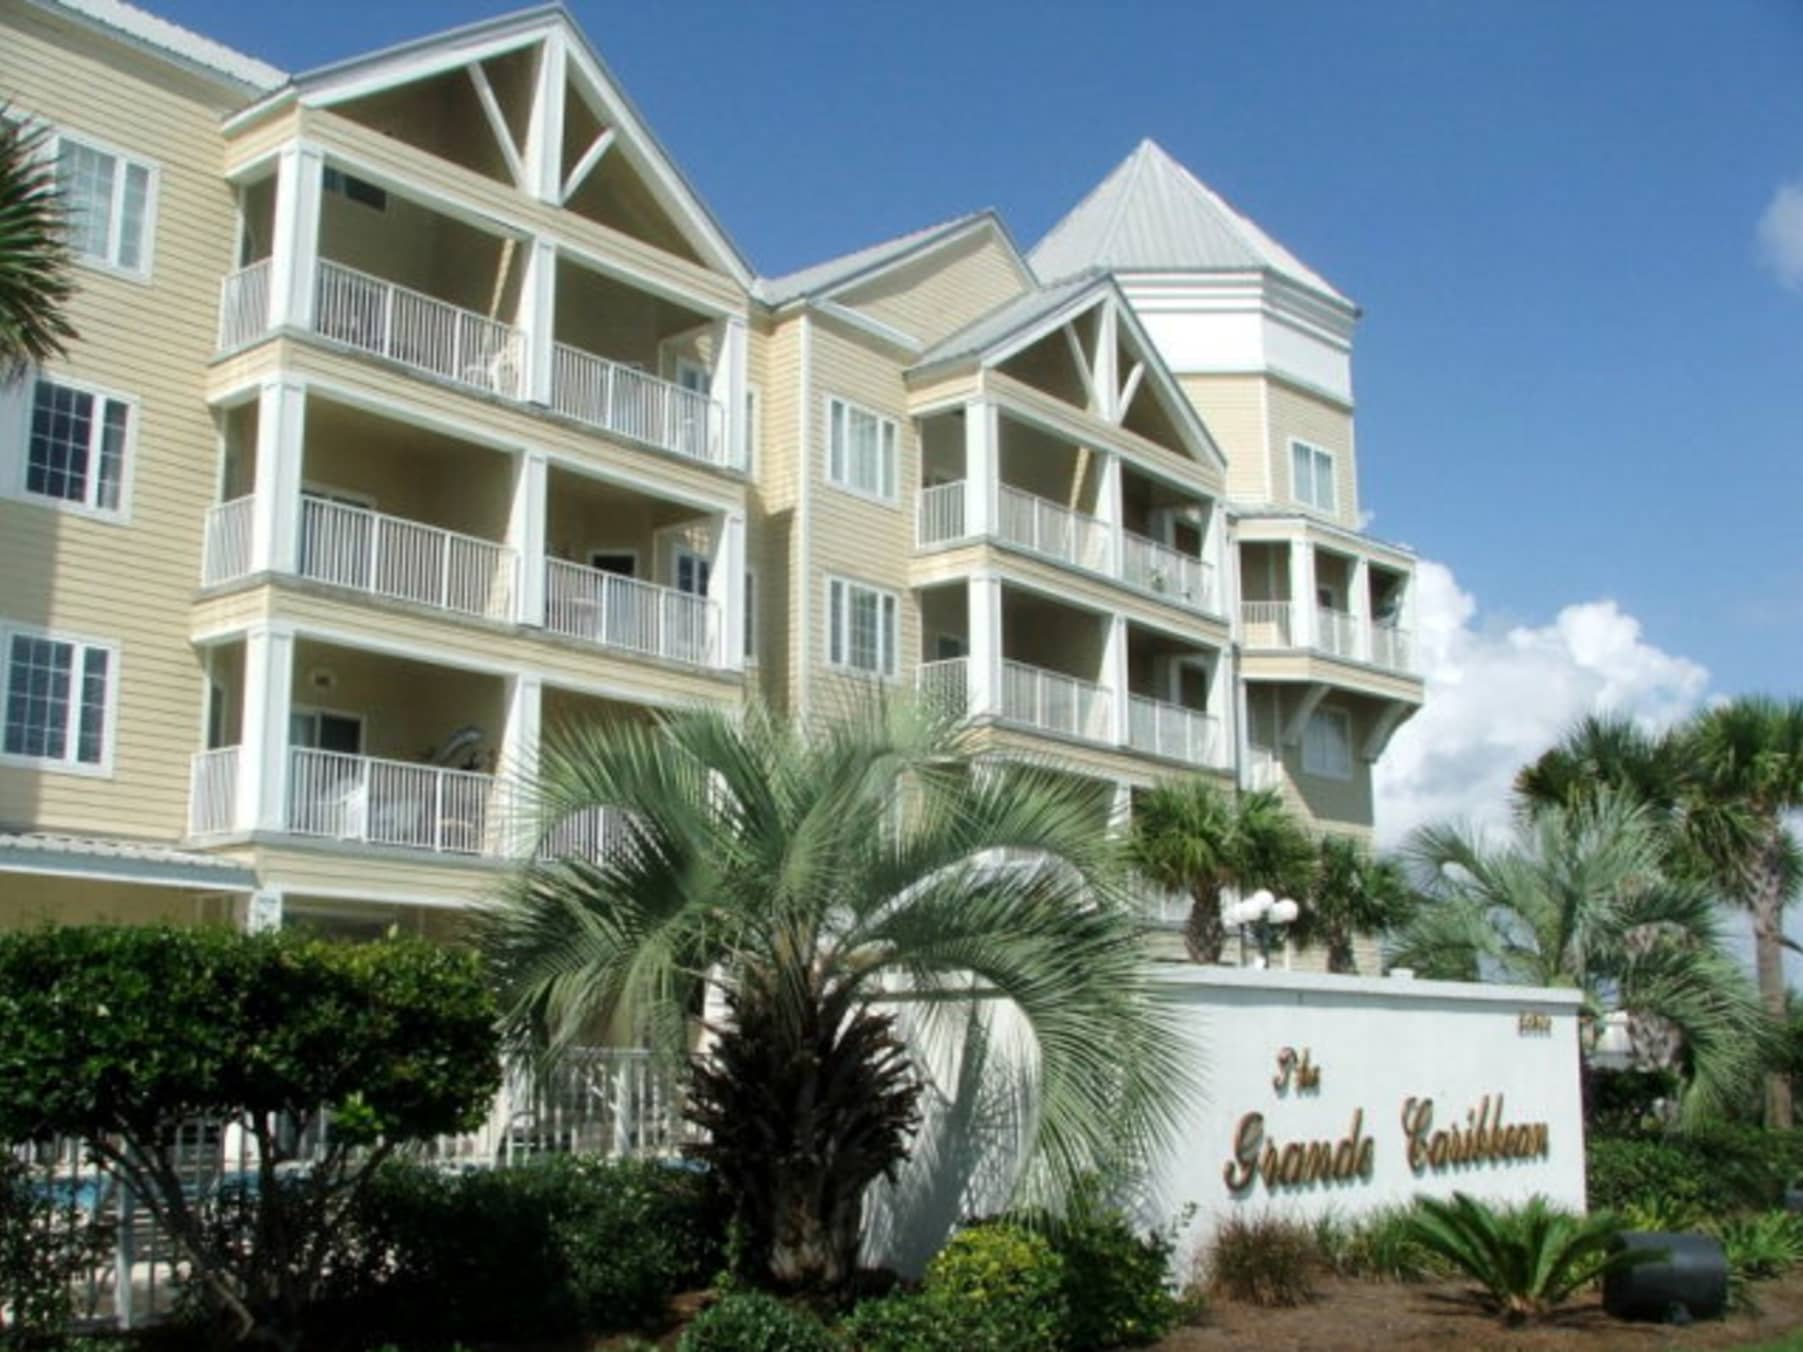 Condos For In Grand Caribbean Orange Beach Al